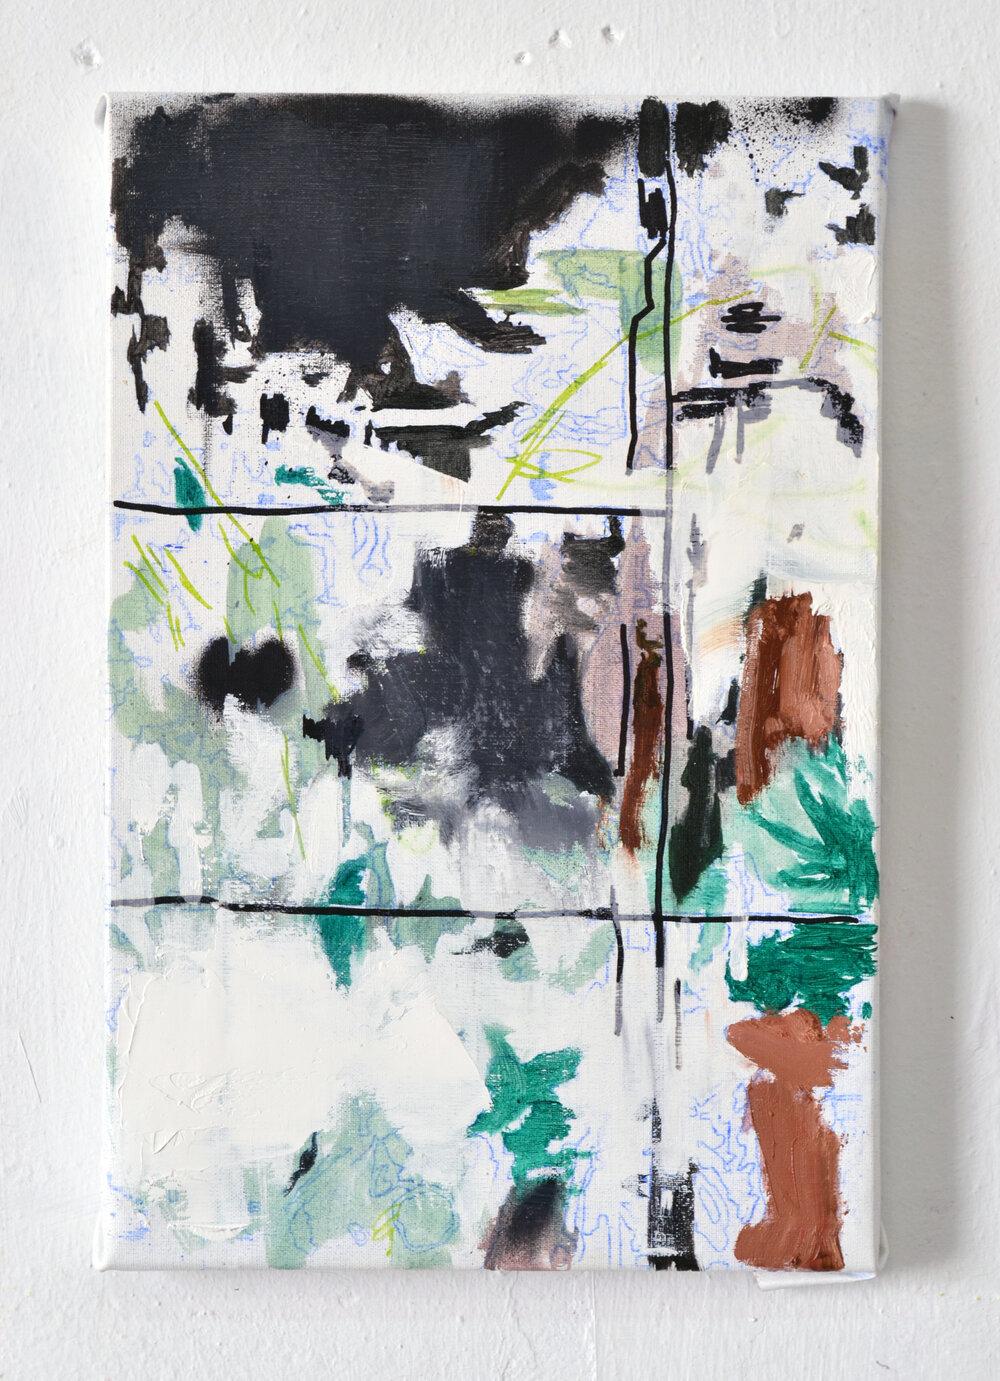 Cuadro de Pablo Merchante por 650 euros +IVA (41 x 27 cm)